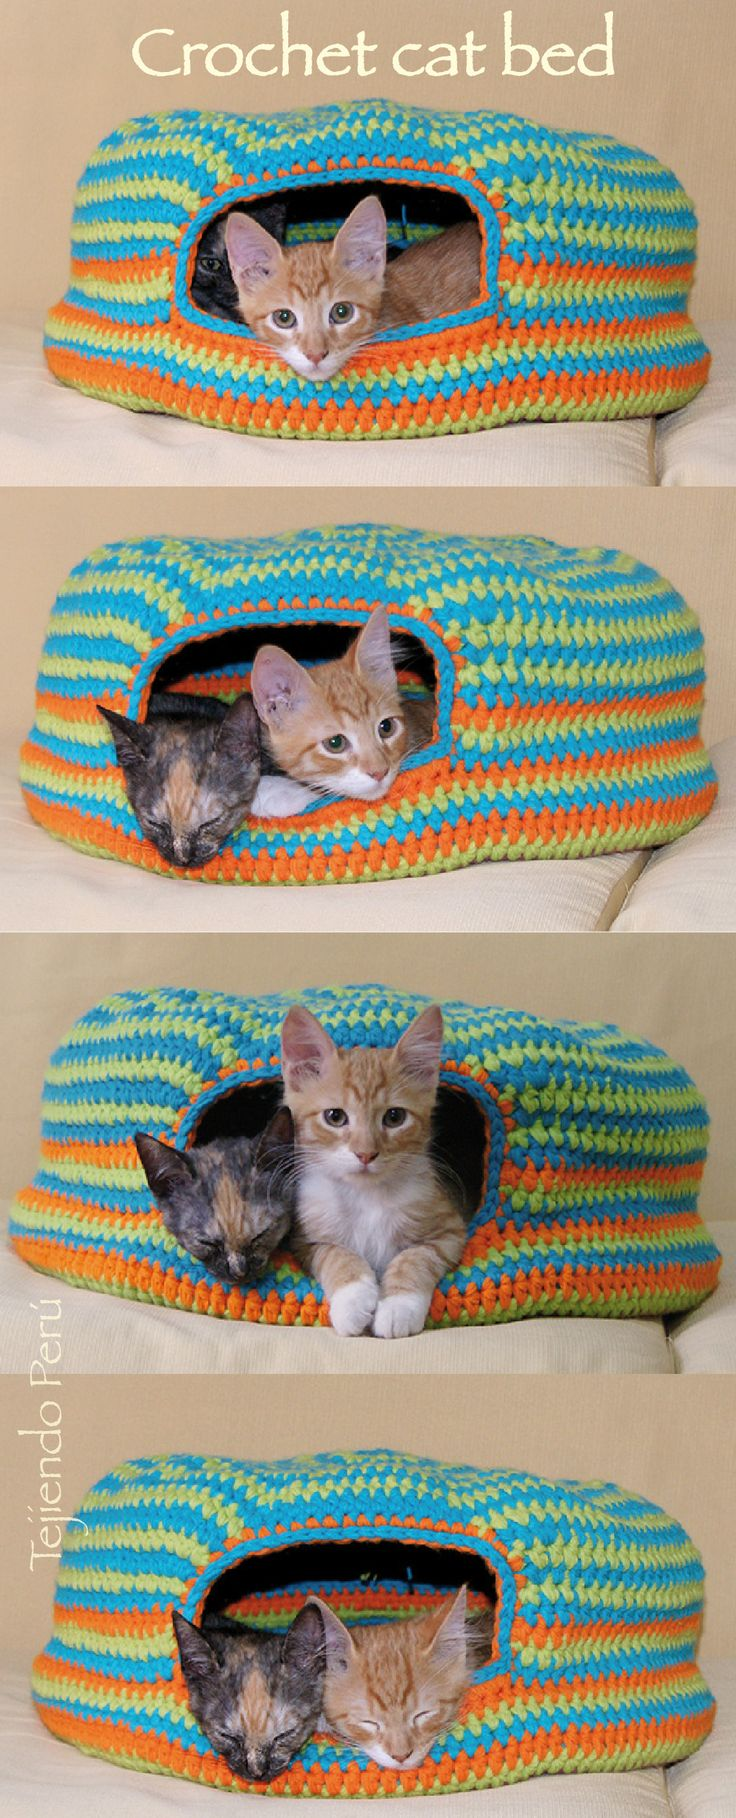 1000 images about diy teckels on pinterest papier mache - Camas para gatos ...